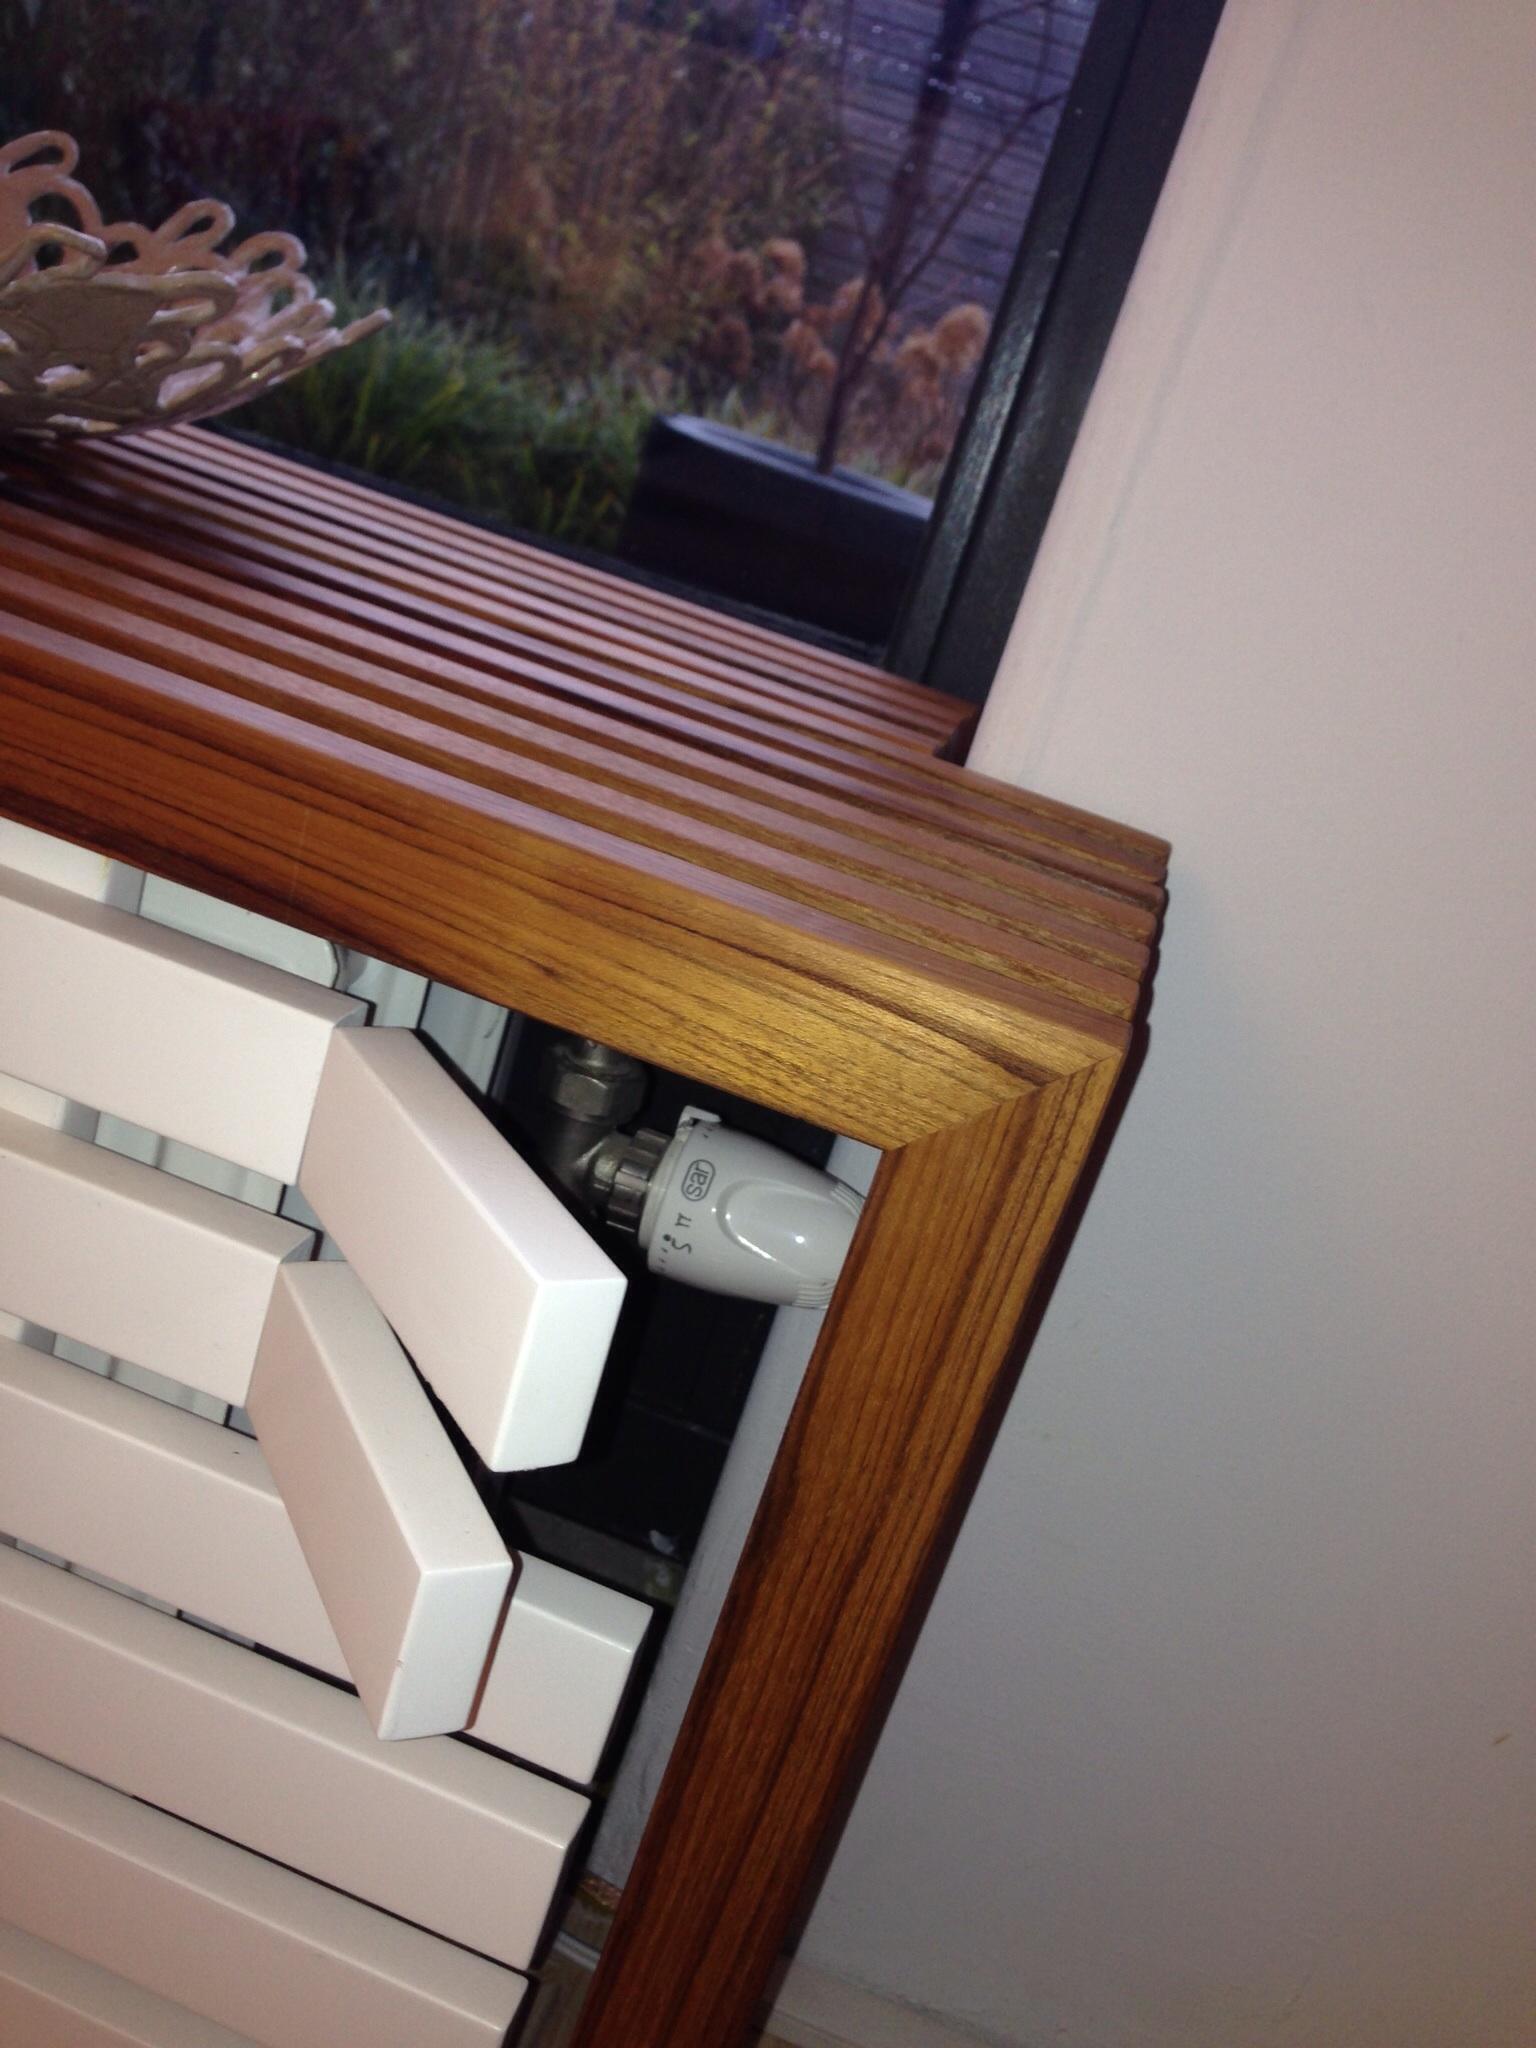 Kast/radiator betimmering